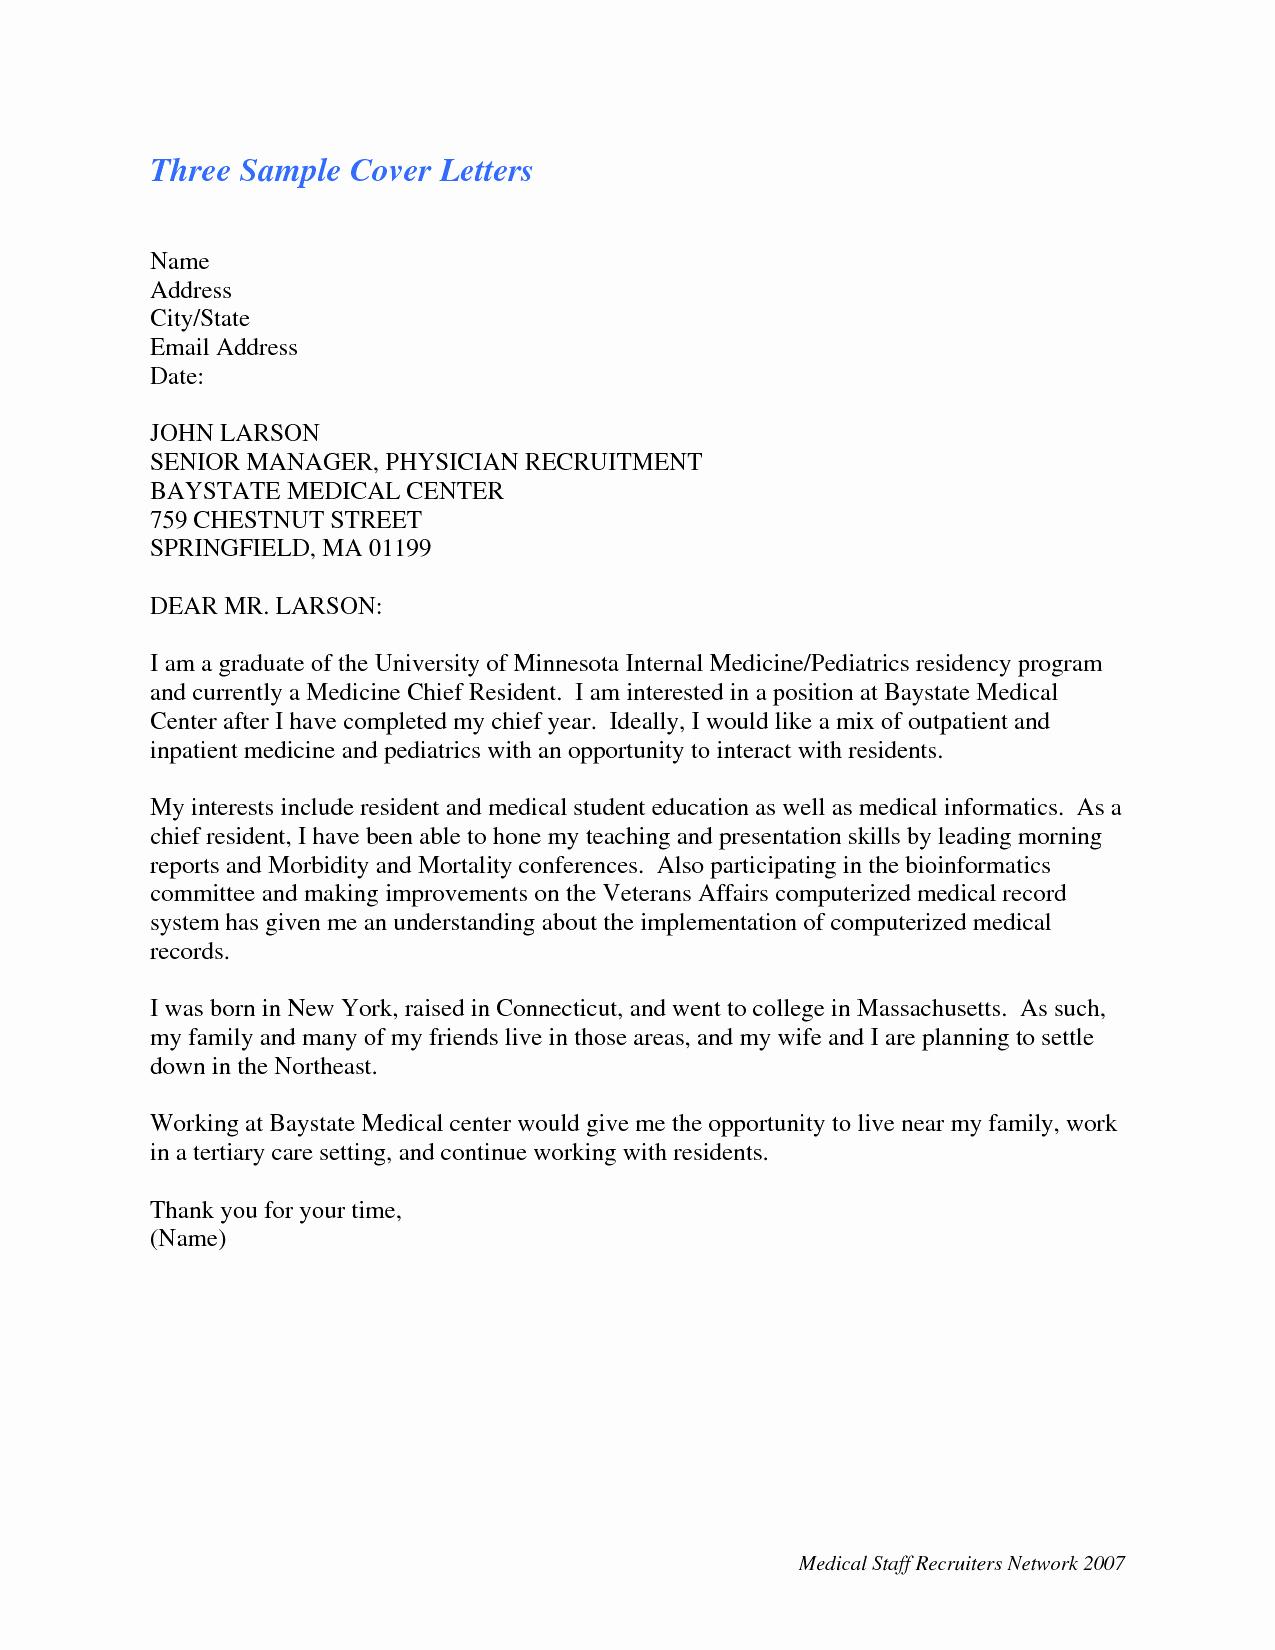 Sample Cover Letter for Internal Position Template - Promotional Letter Interest Elegant 11 Beautiful Cover Letter